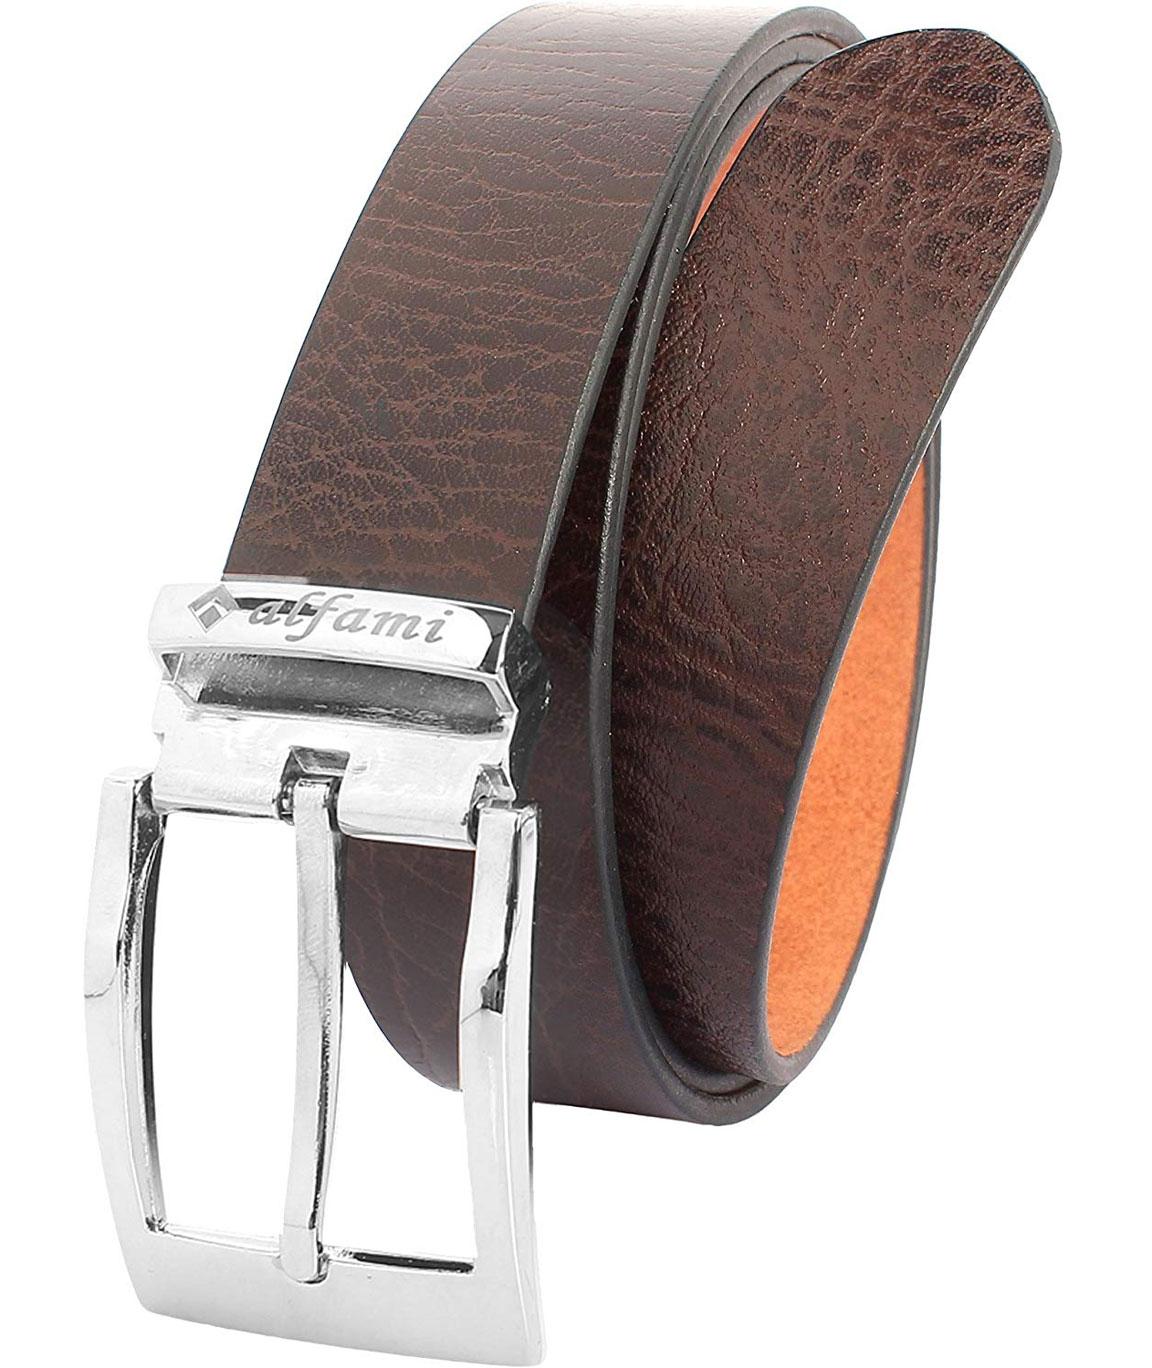 Alfami Mens Genuine Leather Belt Brown Colour All Sizes Cobra Pattern